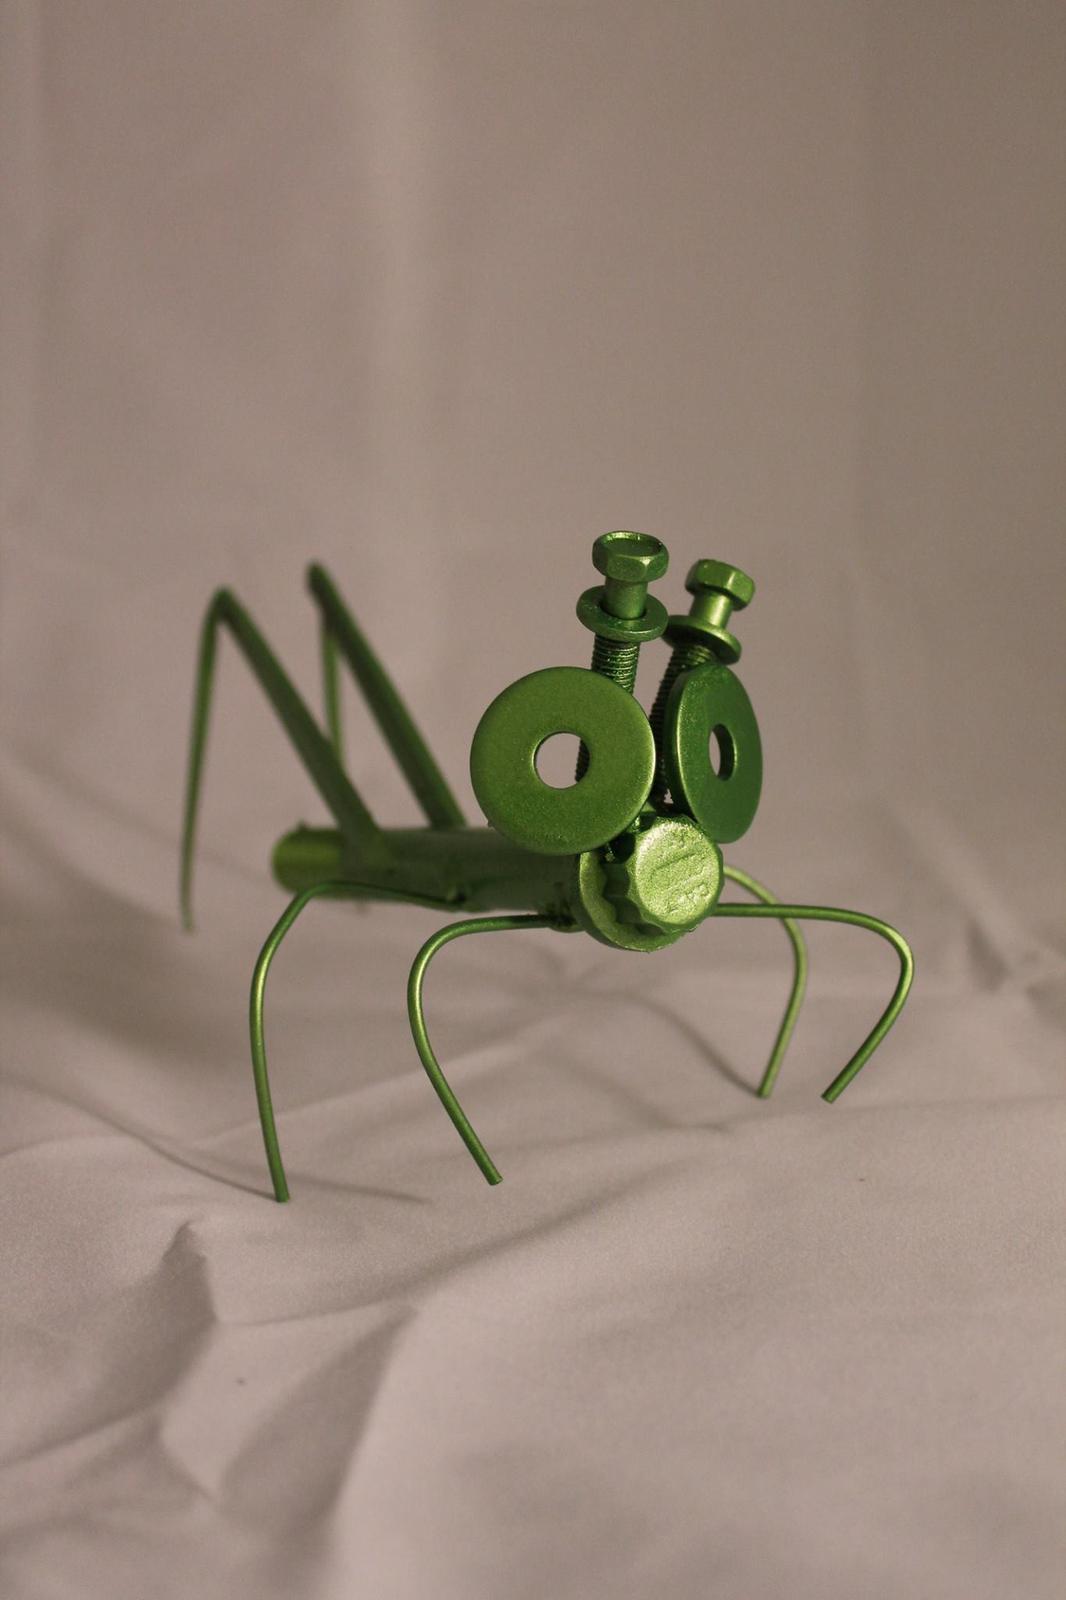 'Charlie' the grasshopper